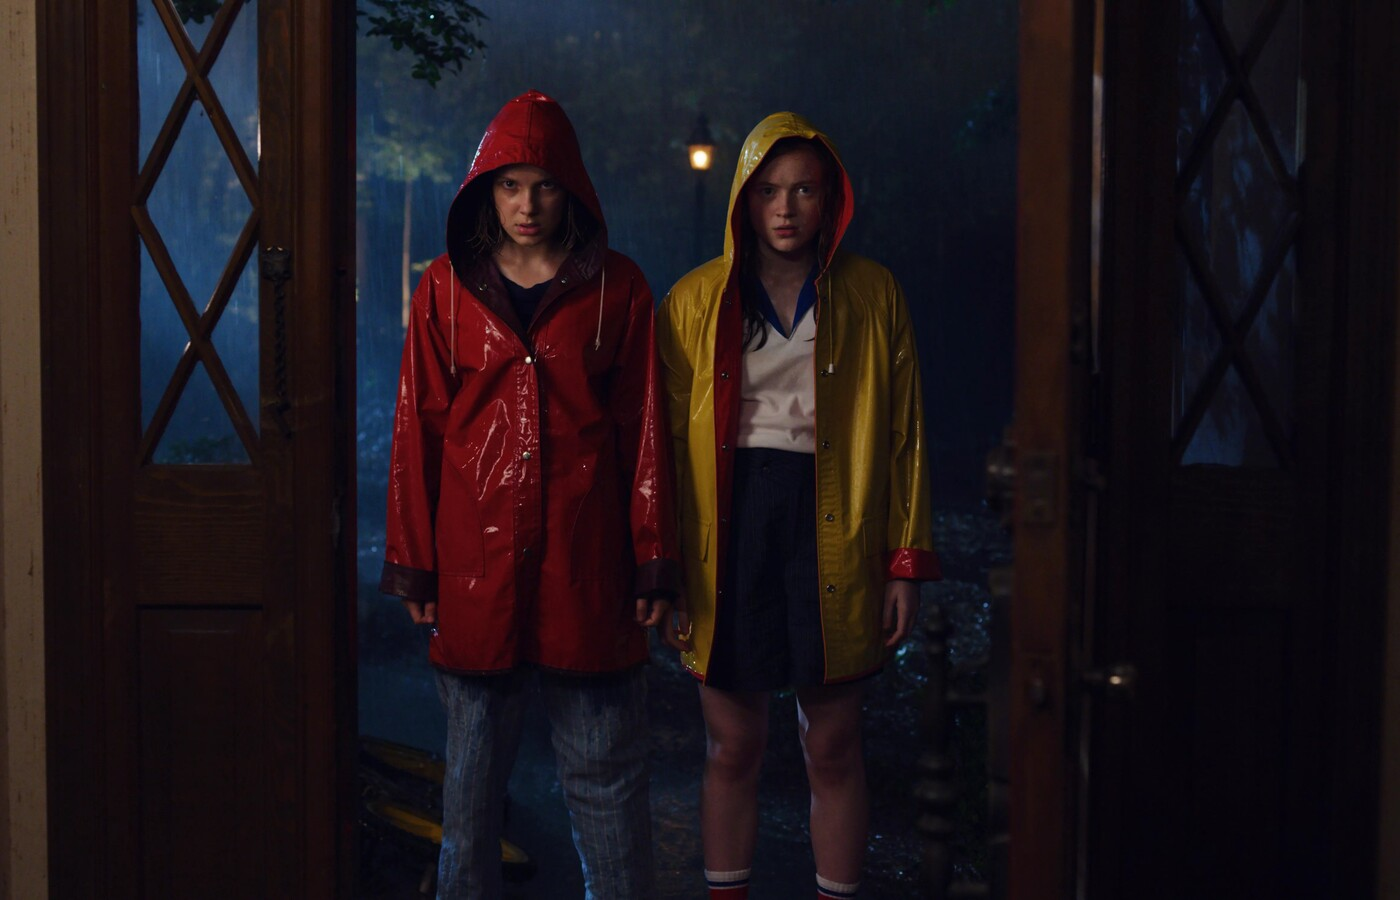 1400x900 Max And Eleven Stranger Things Season 3 1400x900